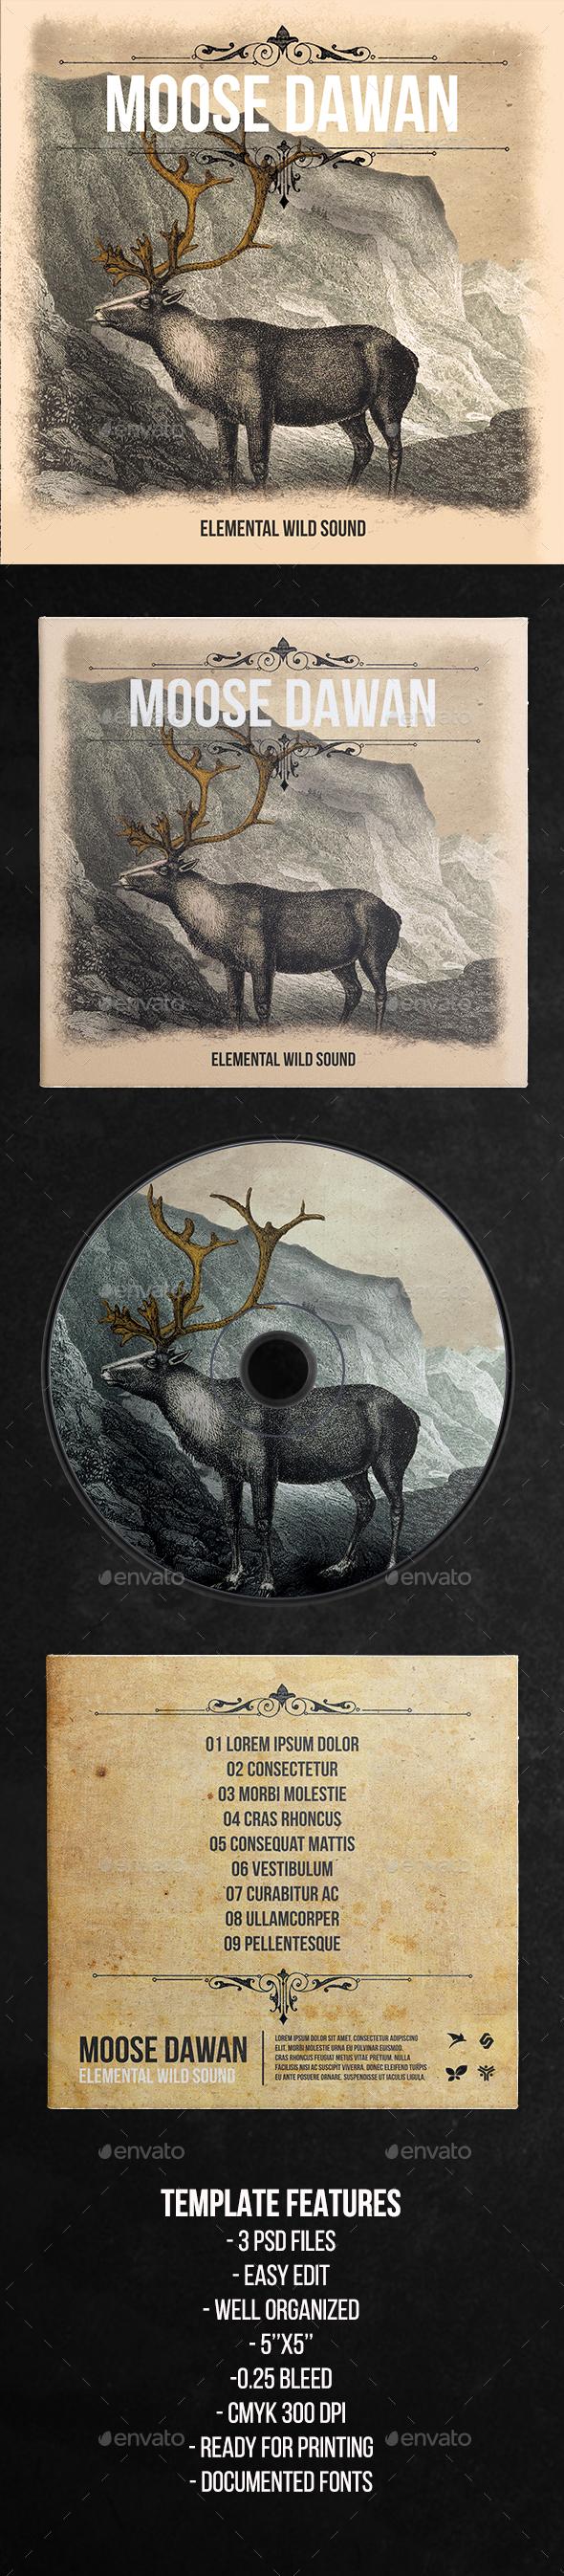 Elemental Wild Sound - CD Cover Artwork Template - CD & DVD Artwork Print Templates